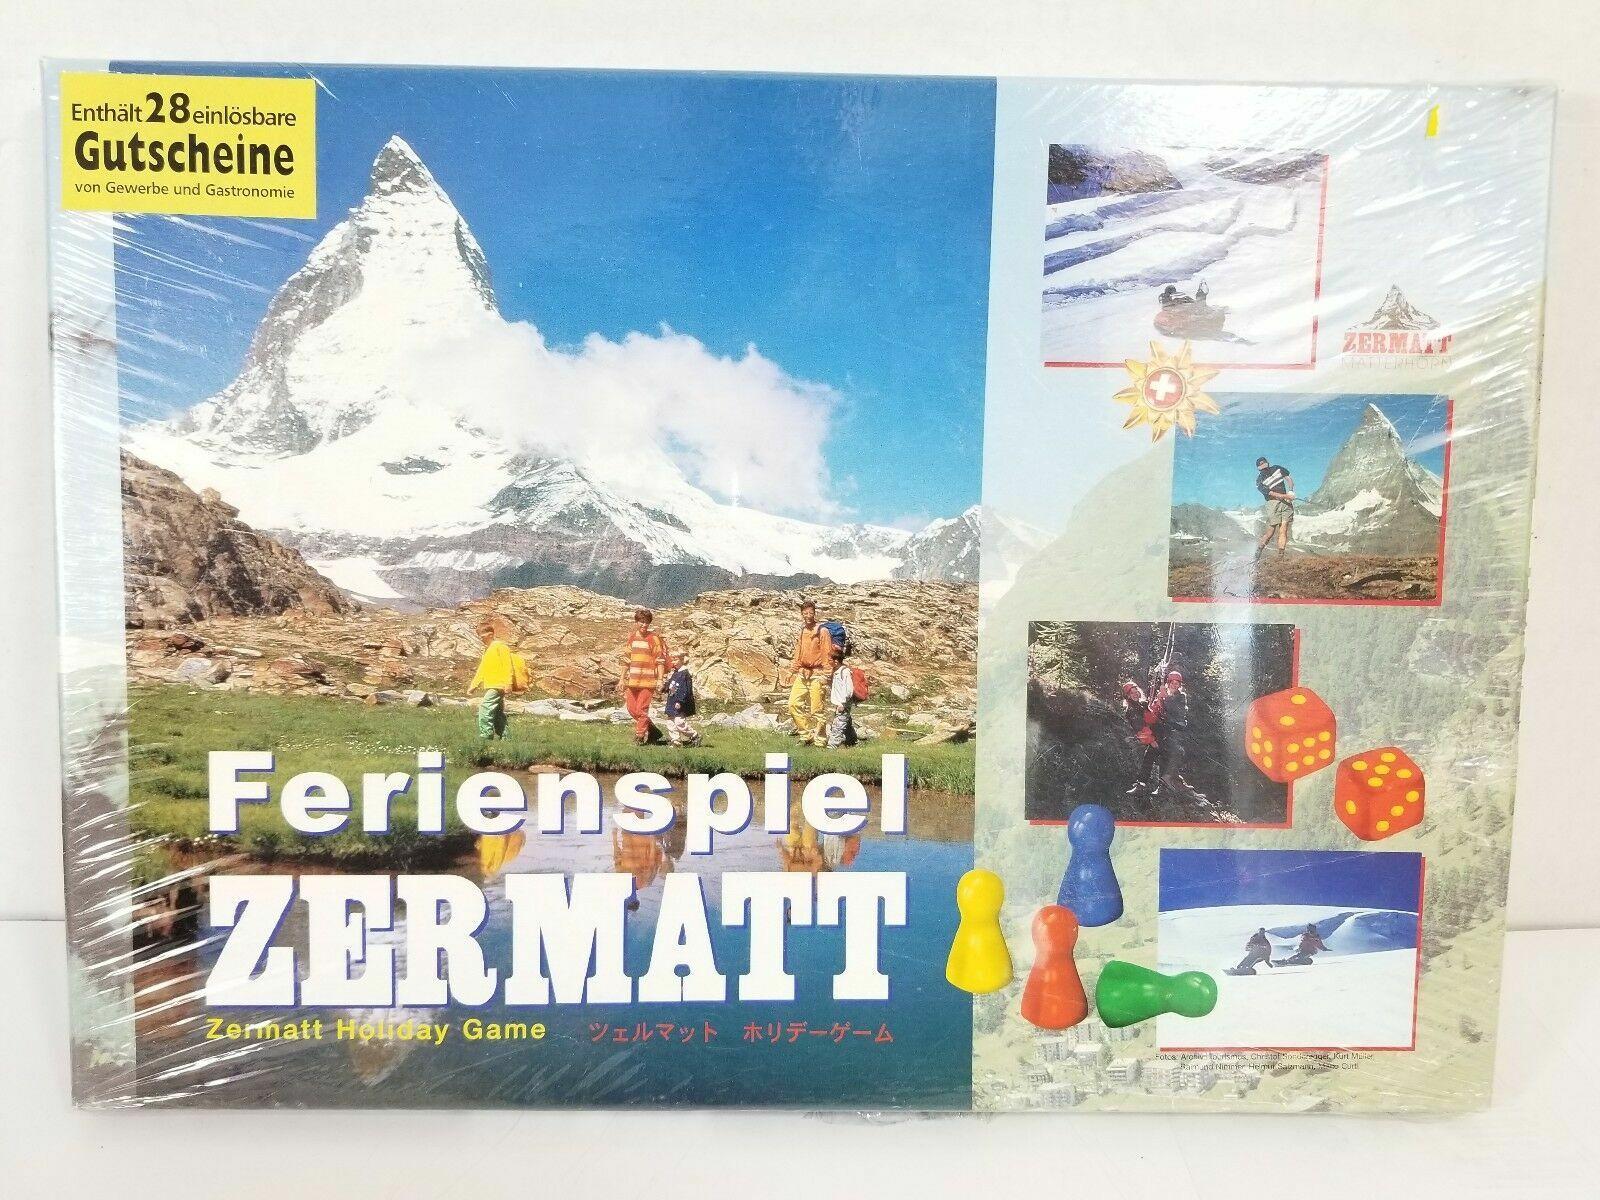 Sito ufficiale Vintage Geruomo tavola gioco Ferienspiel Zermatt Matterhorn by Engeli Engeli Engeli & Partner nuovo  in vendita